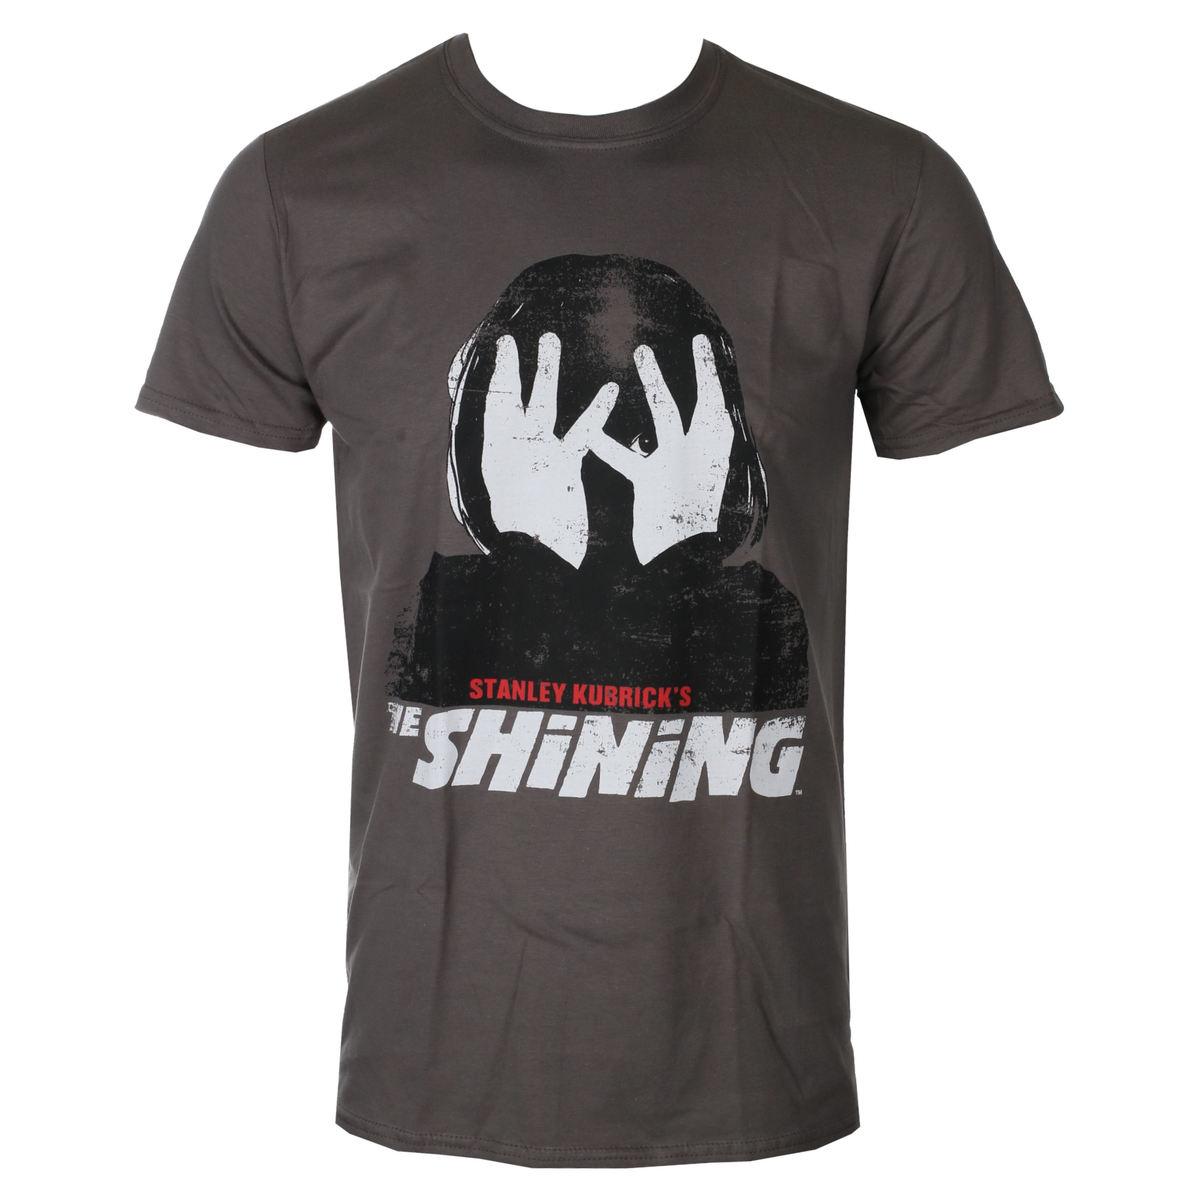 265a0358 film t-shirt men's Osvícení - Dark Grey - HYBRIS - WB-1-SHIN002-H78 ...